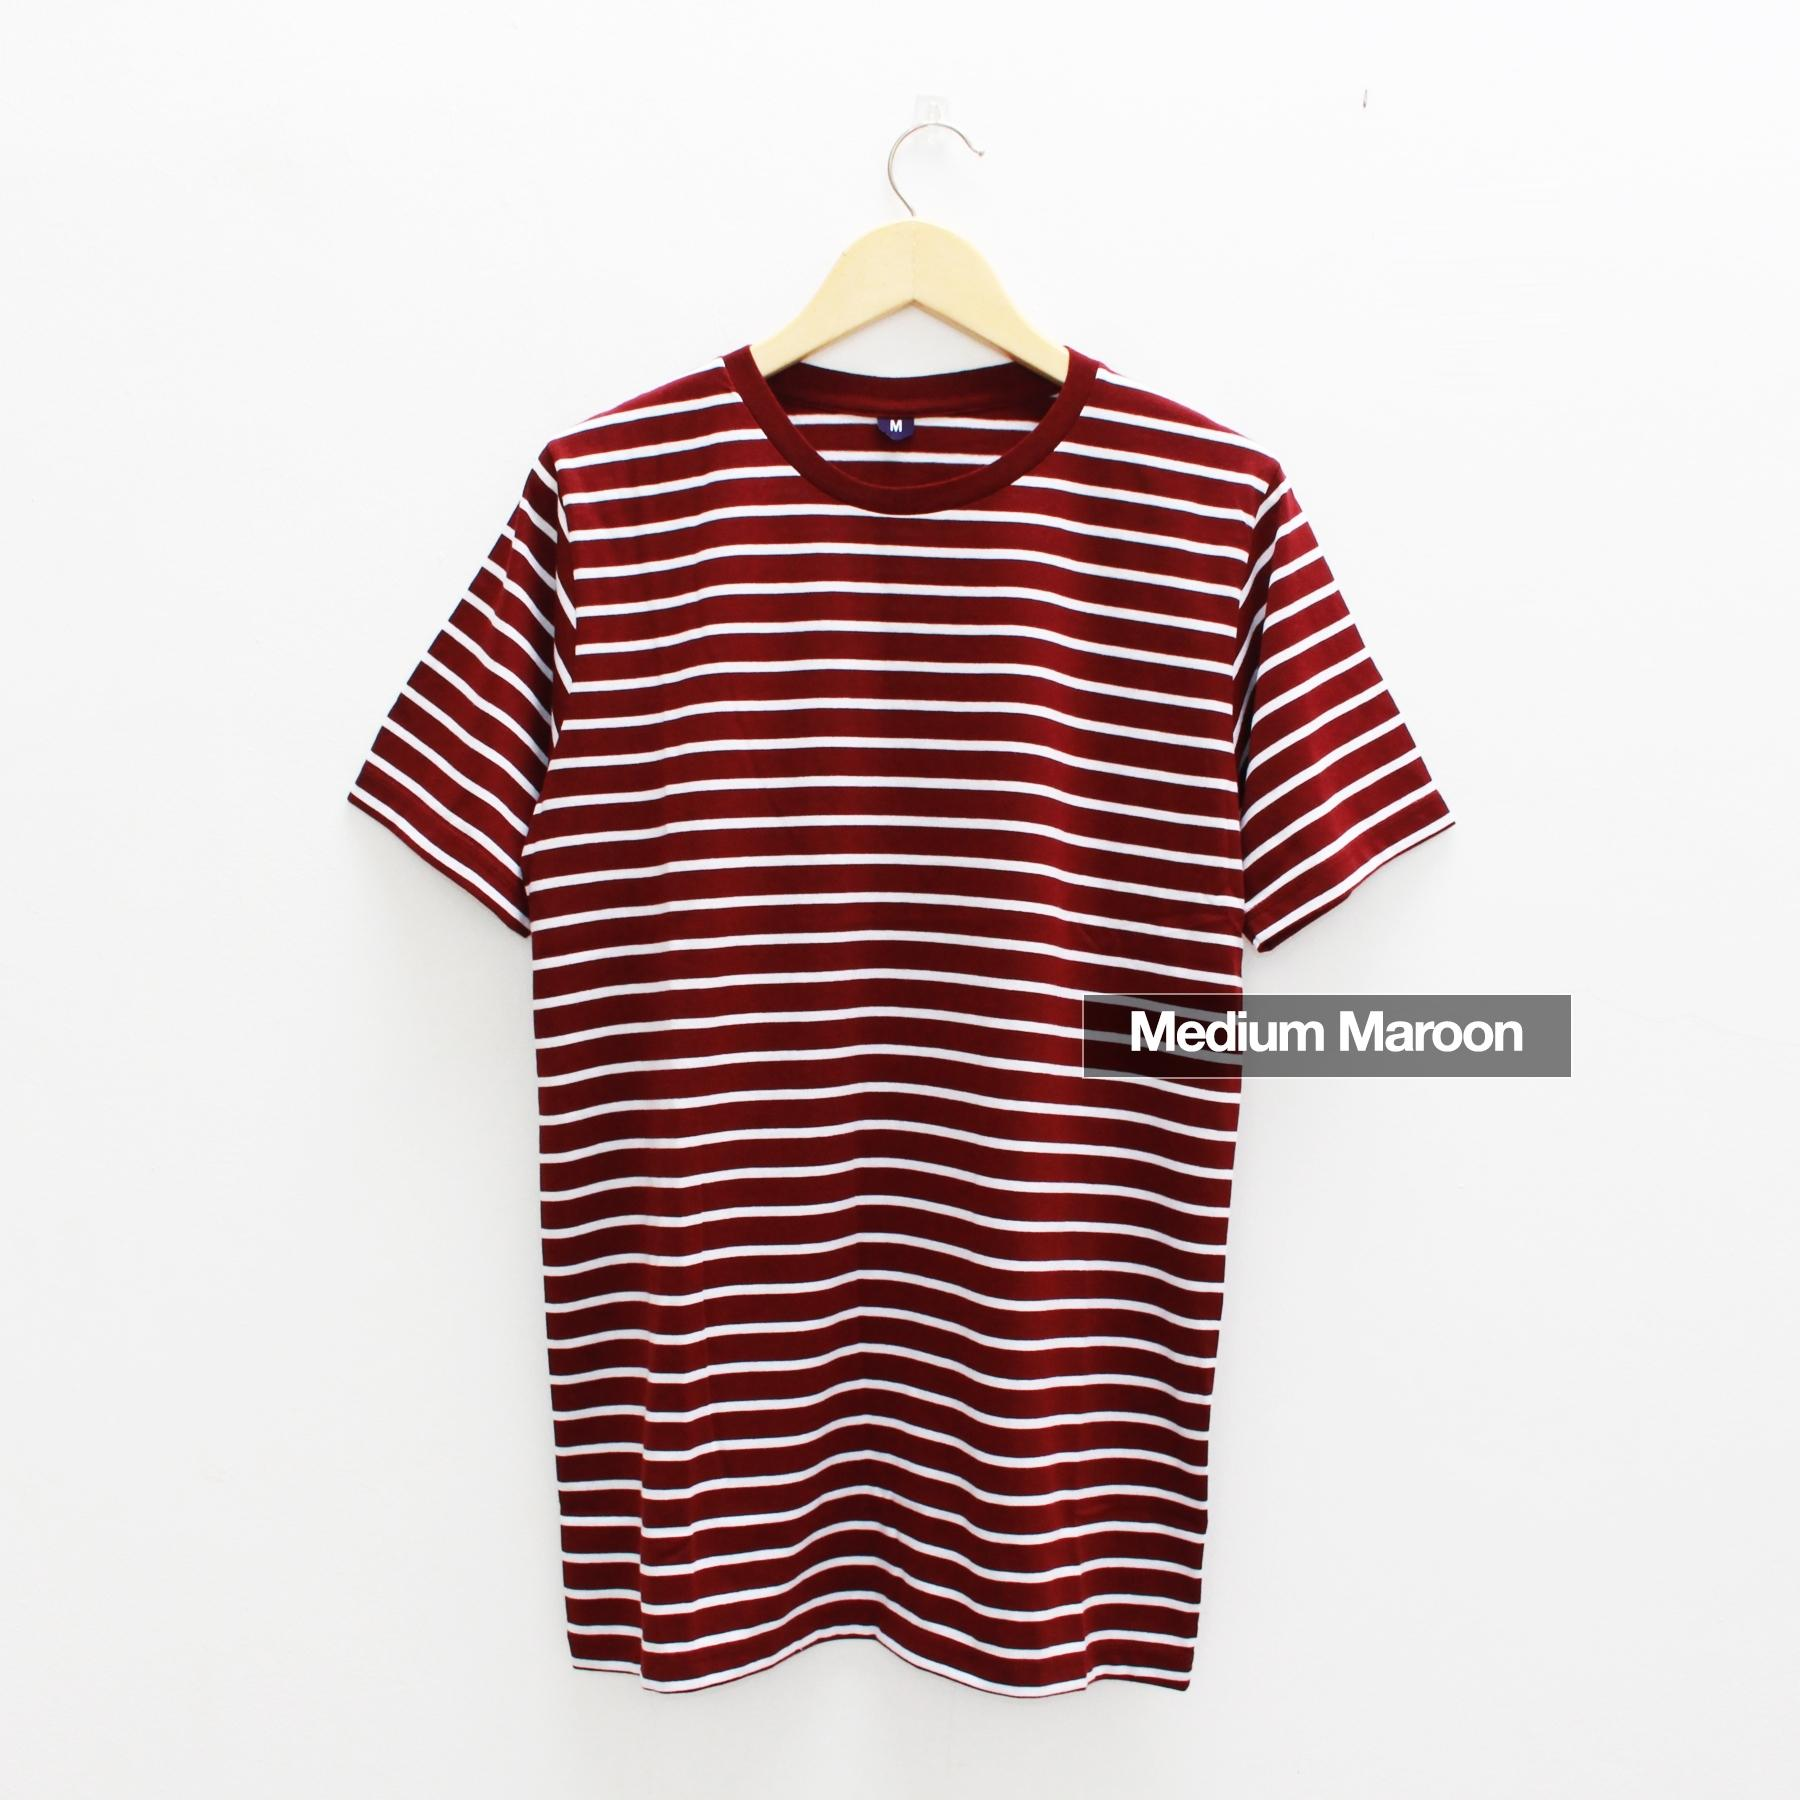 Kaos Belang Stripe Lengan Pendek Warna Medium Maroon